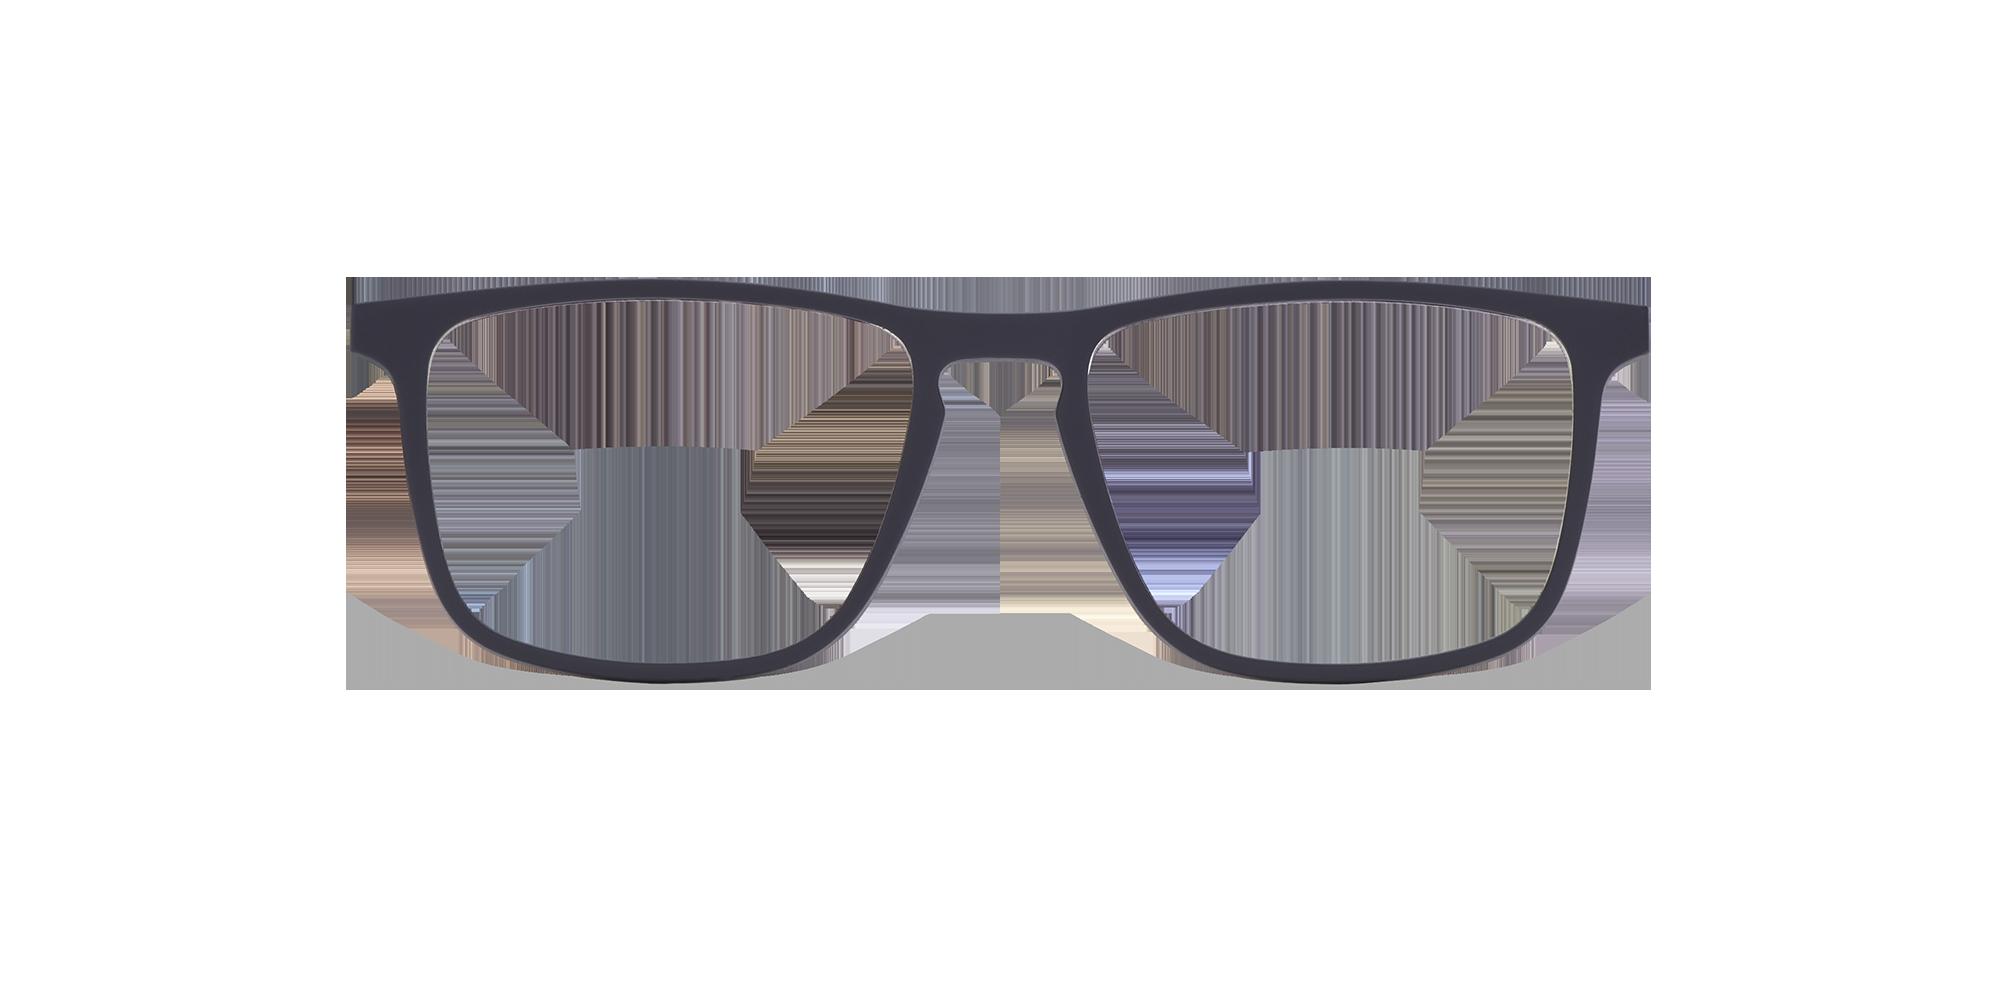 afflelou/france/products/smart_clip/clips_glasses/07630036428801_face.png